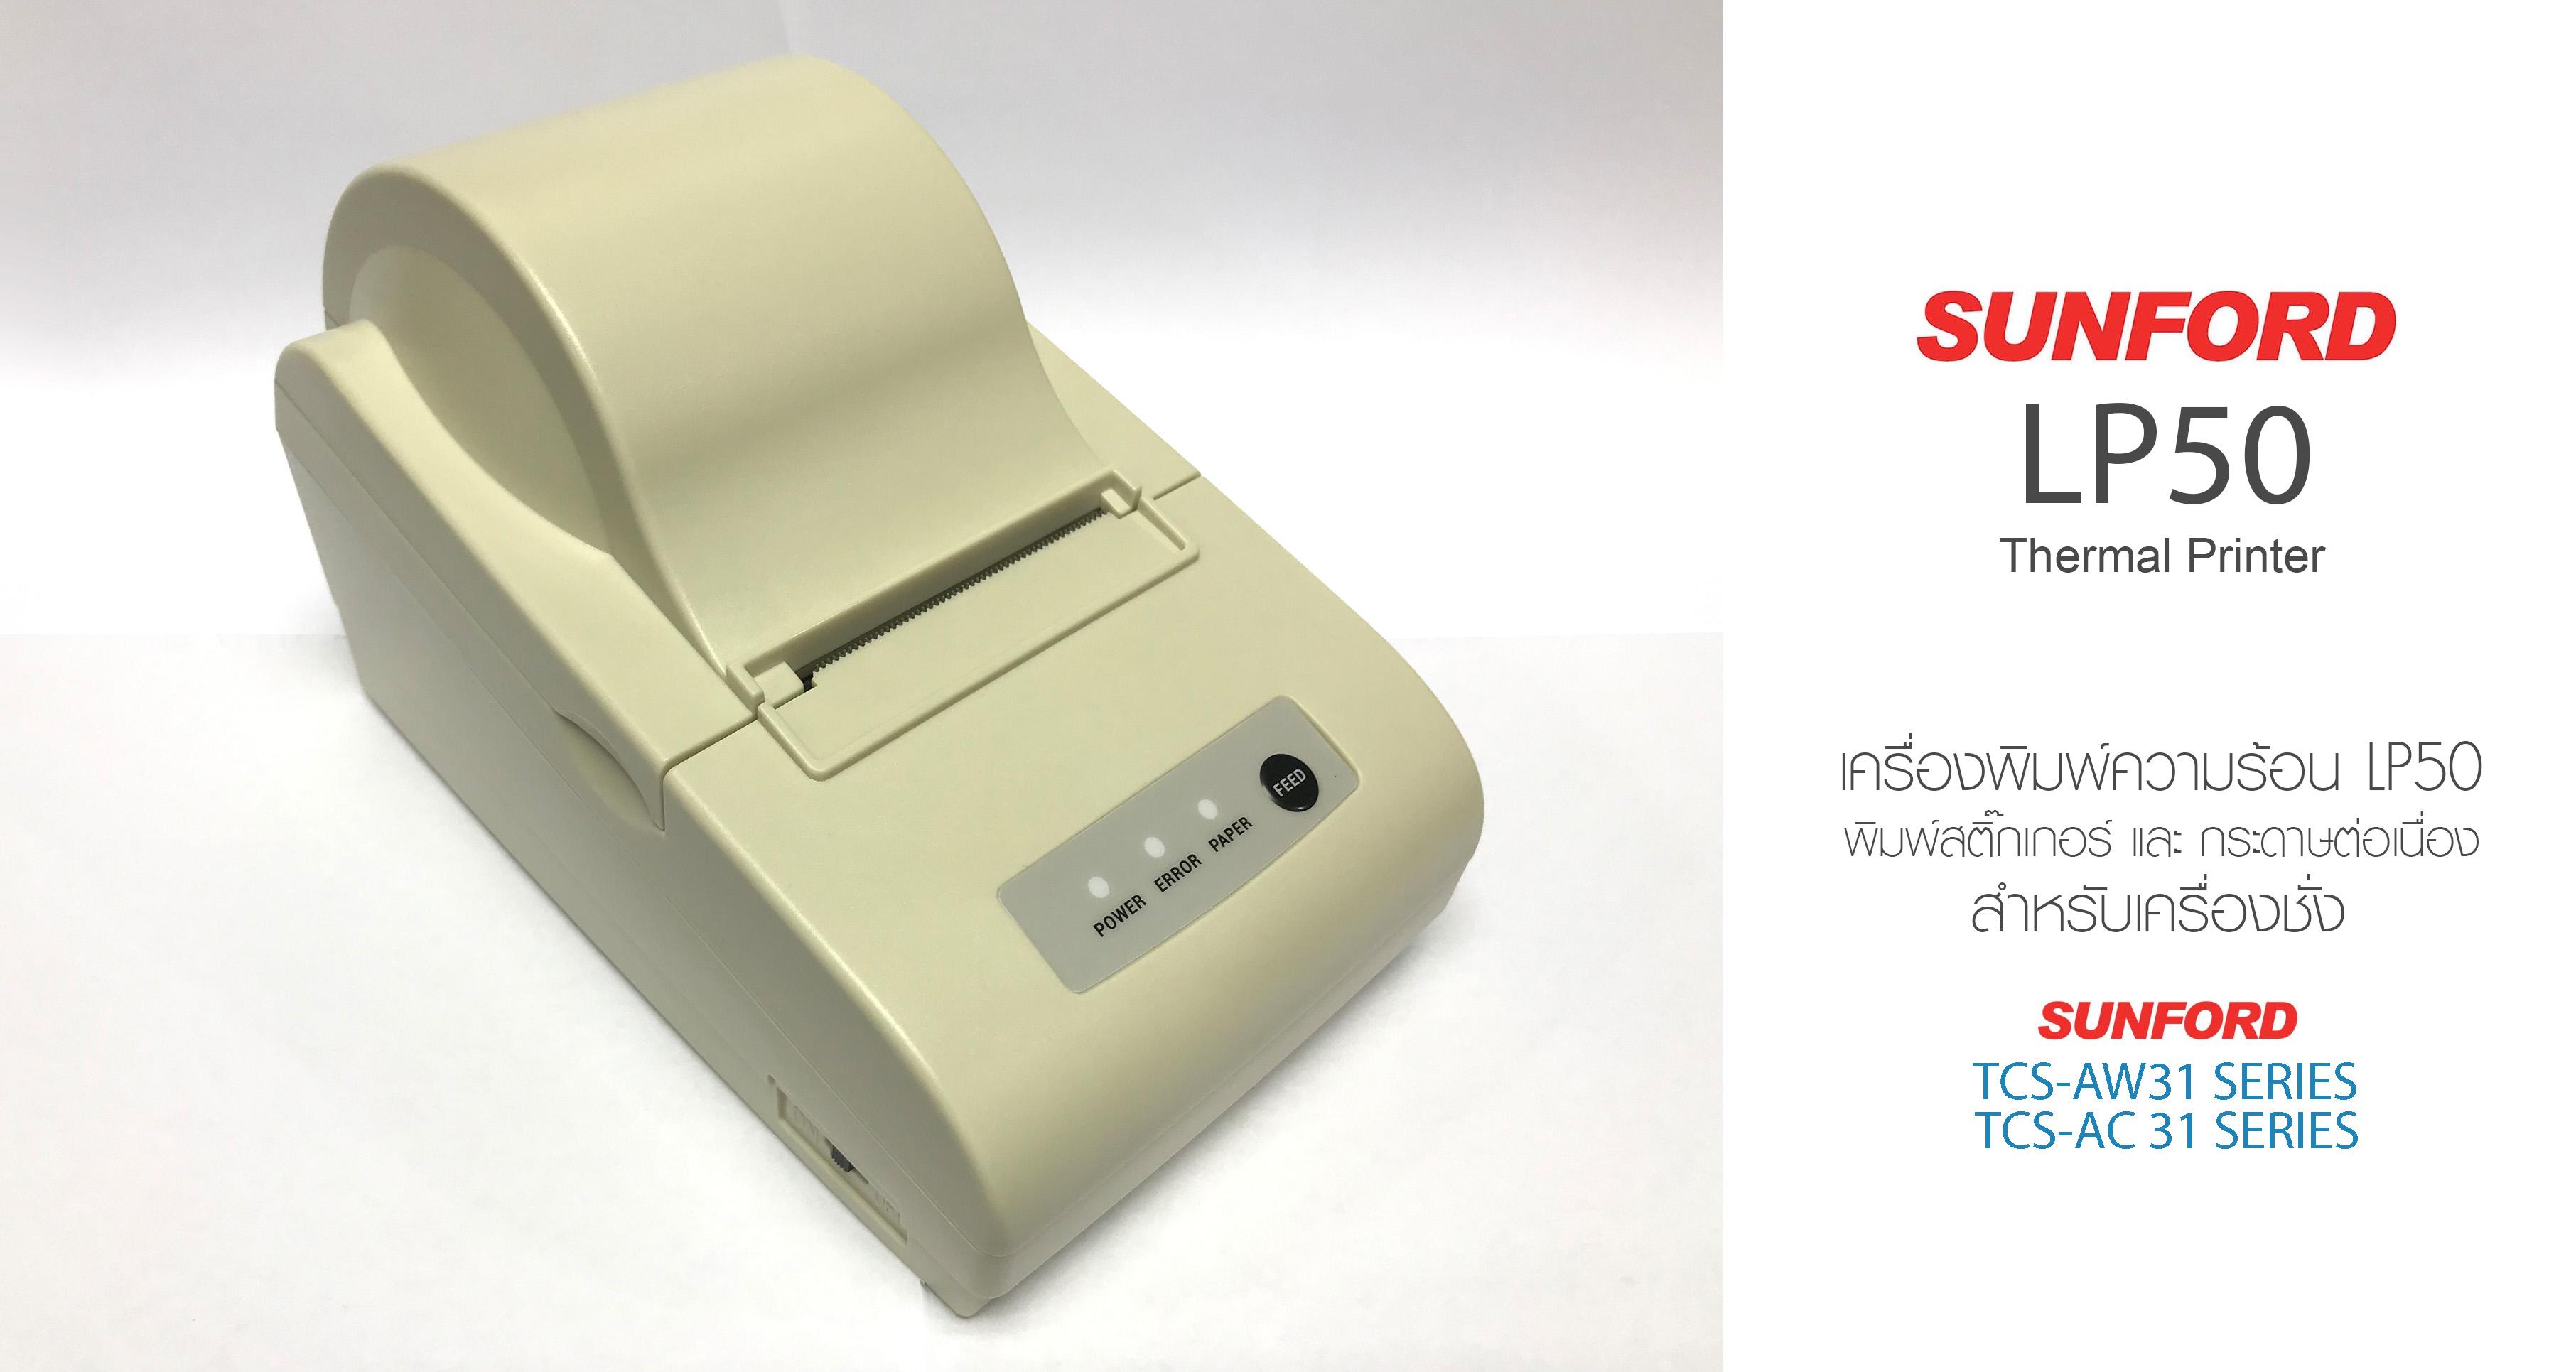 SUNFORD TCS-300-AW31 พร้อมเครื่องพิมพ์ LP50